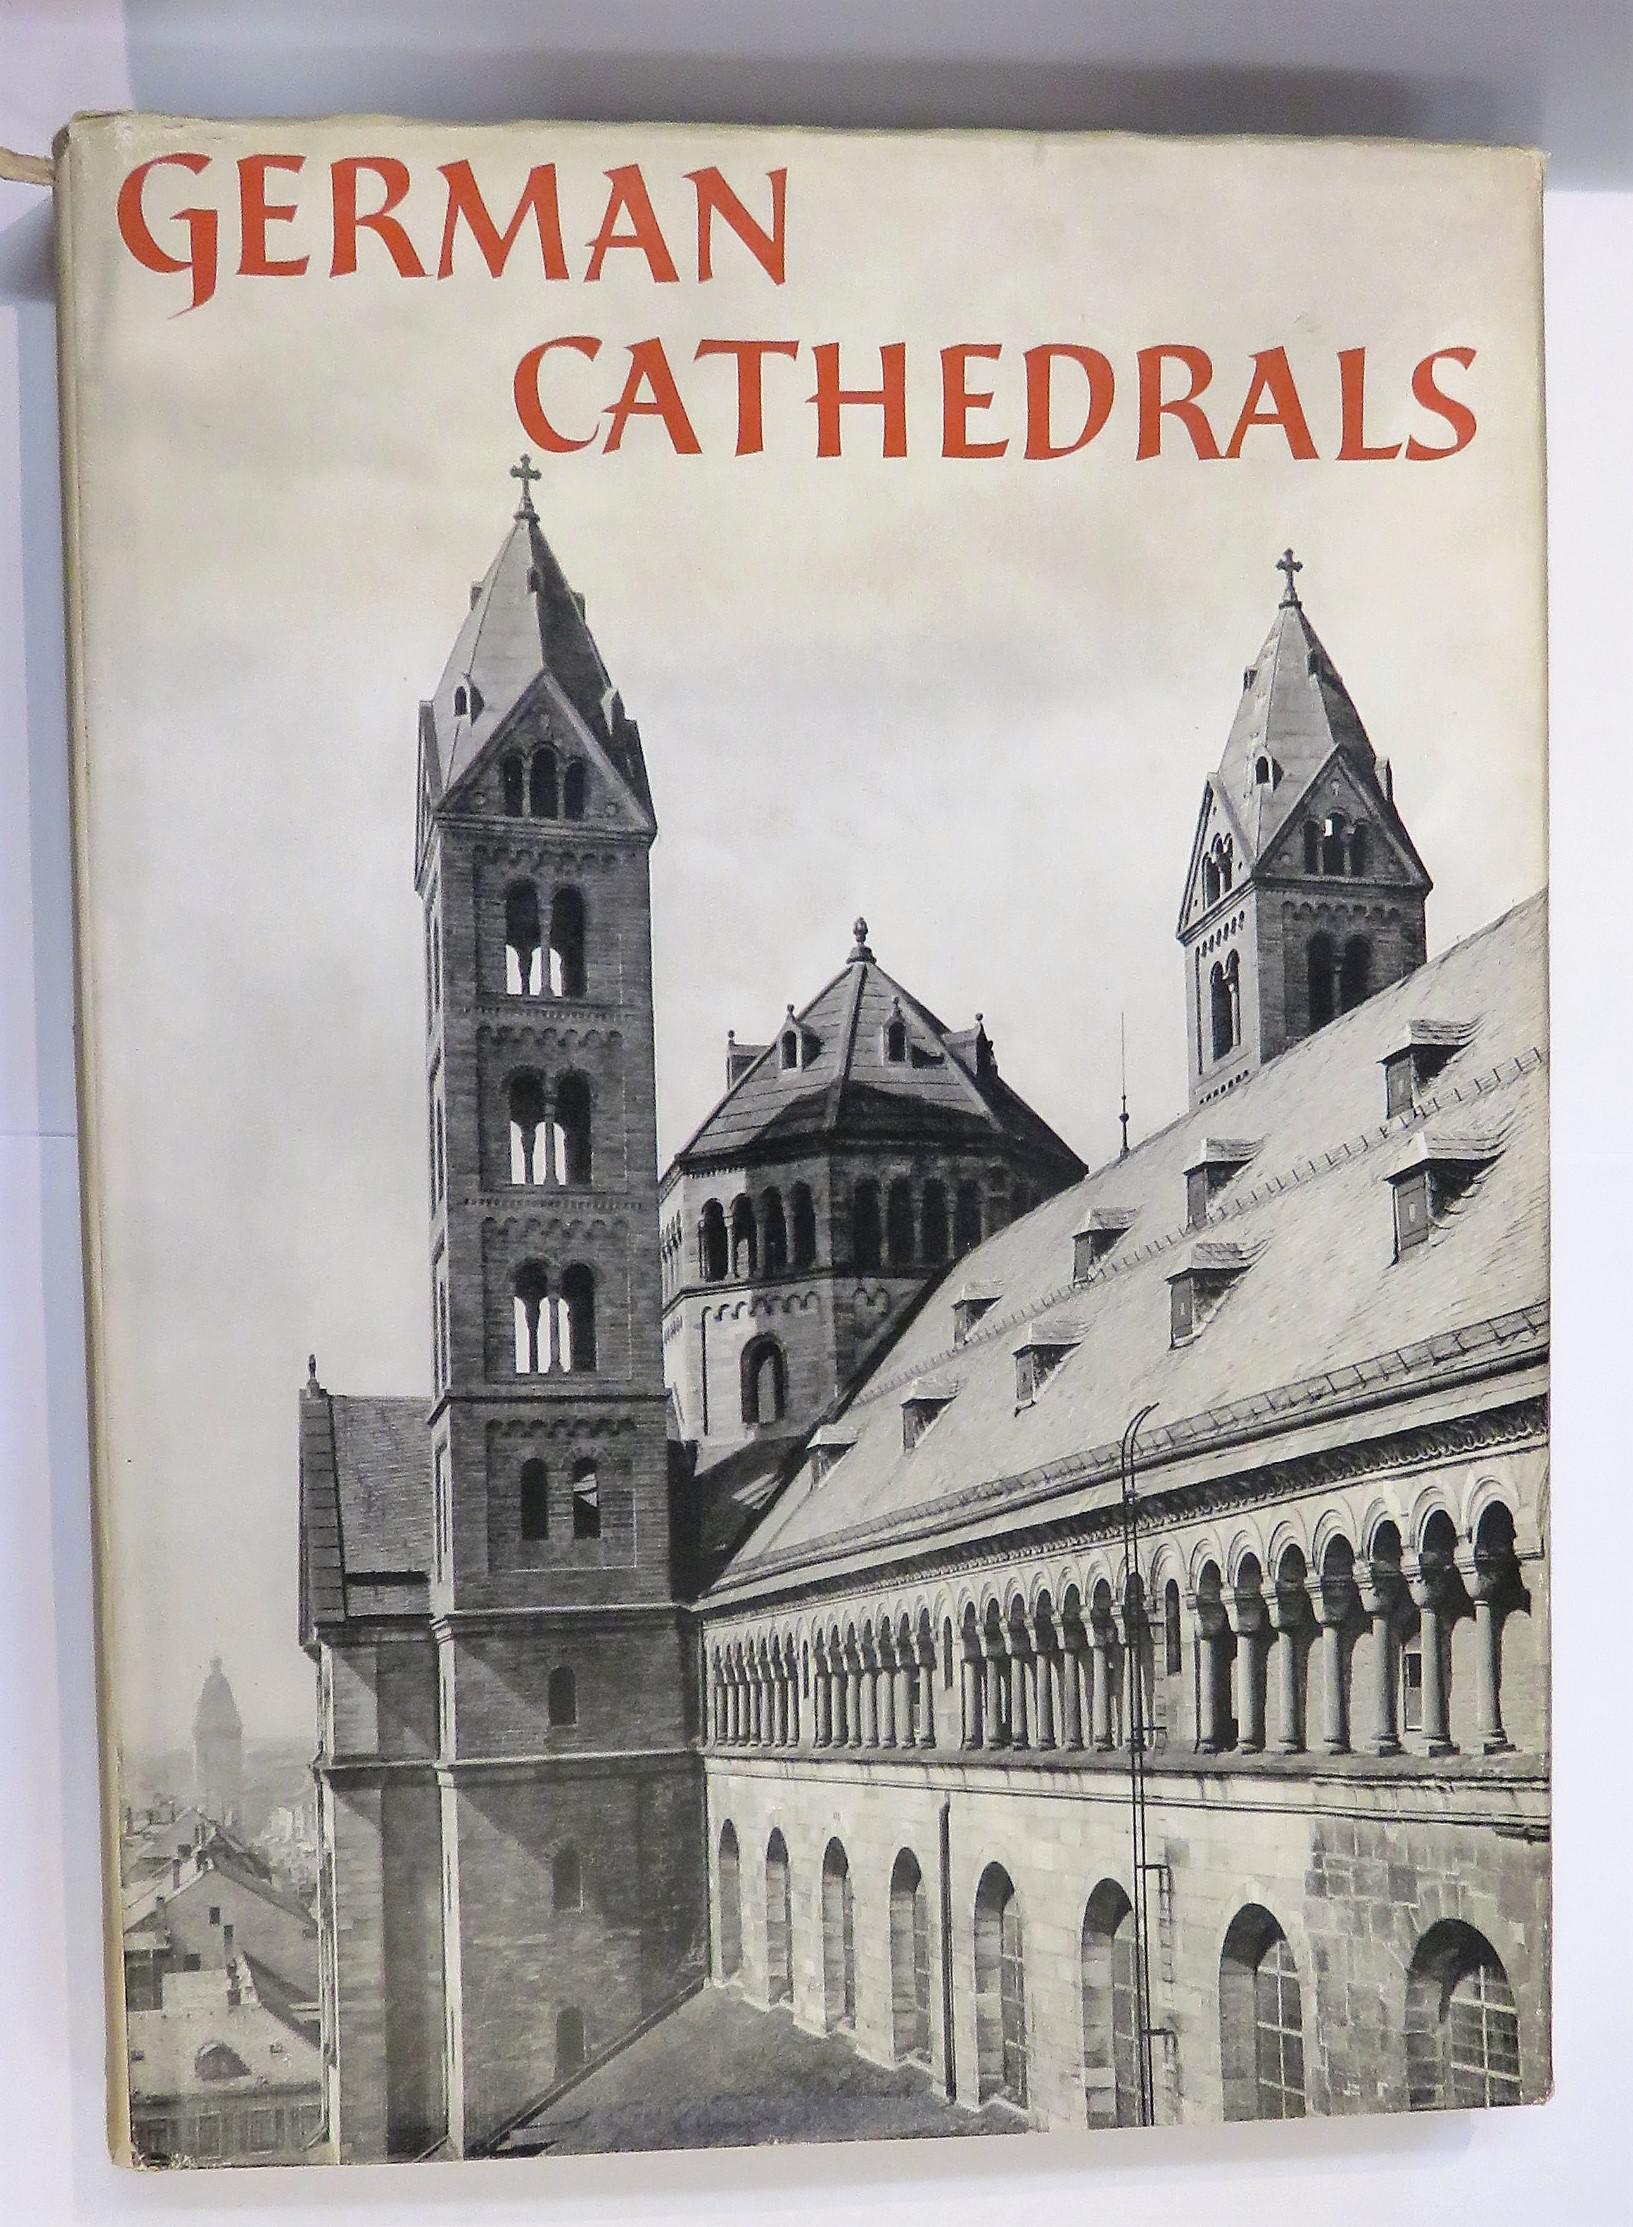 German Cathedrals